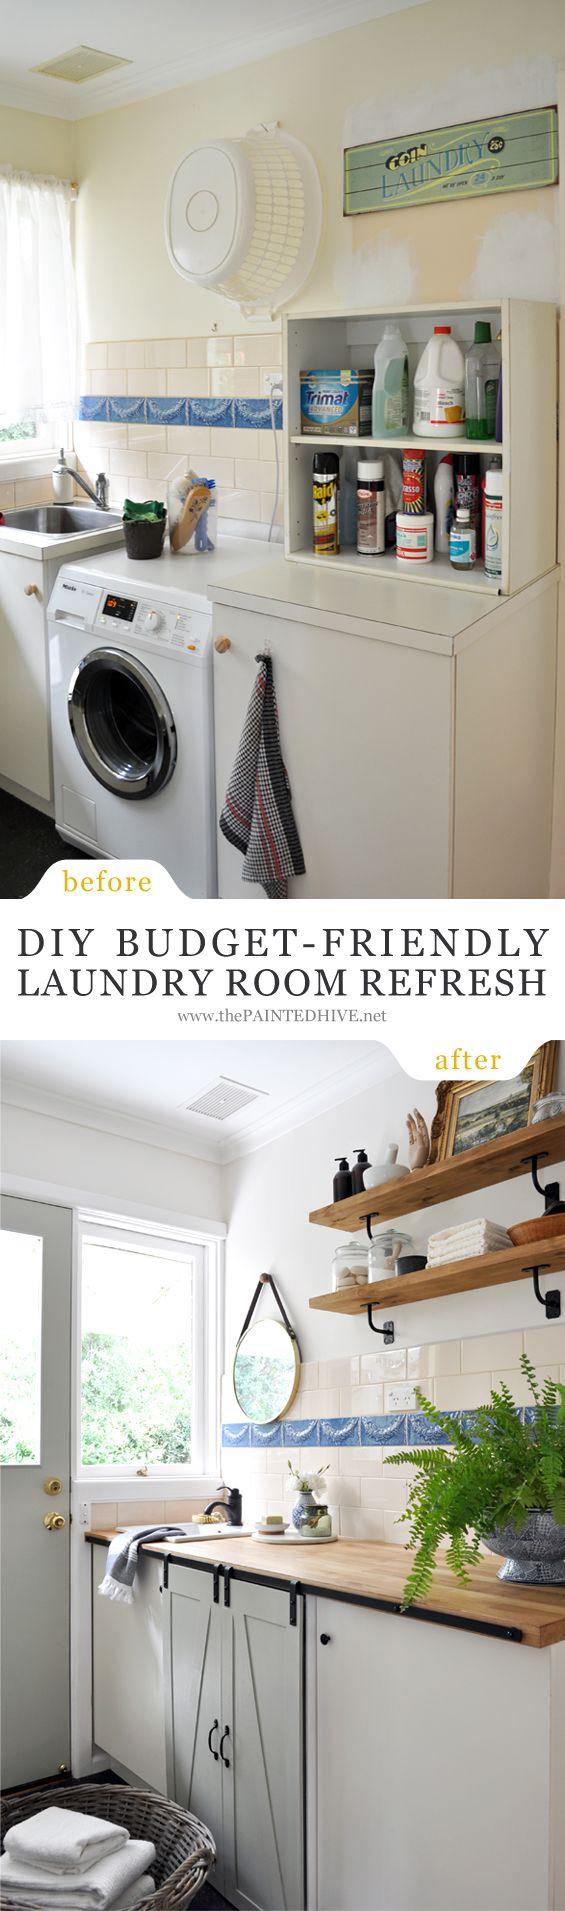 748 best laundry room ideas images on pinterest laundry room 748 best laundry room ideas images on pinterest laundry room design room and laundry